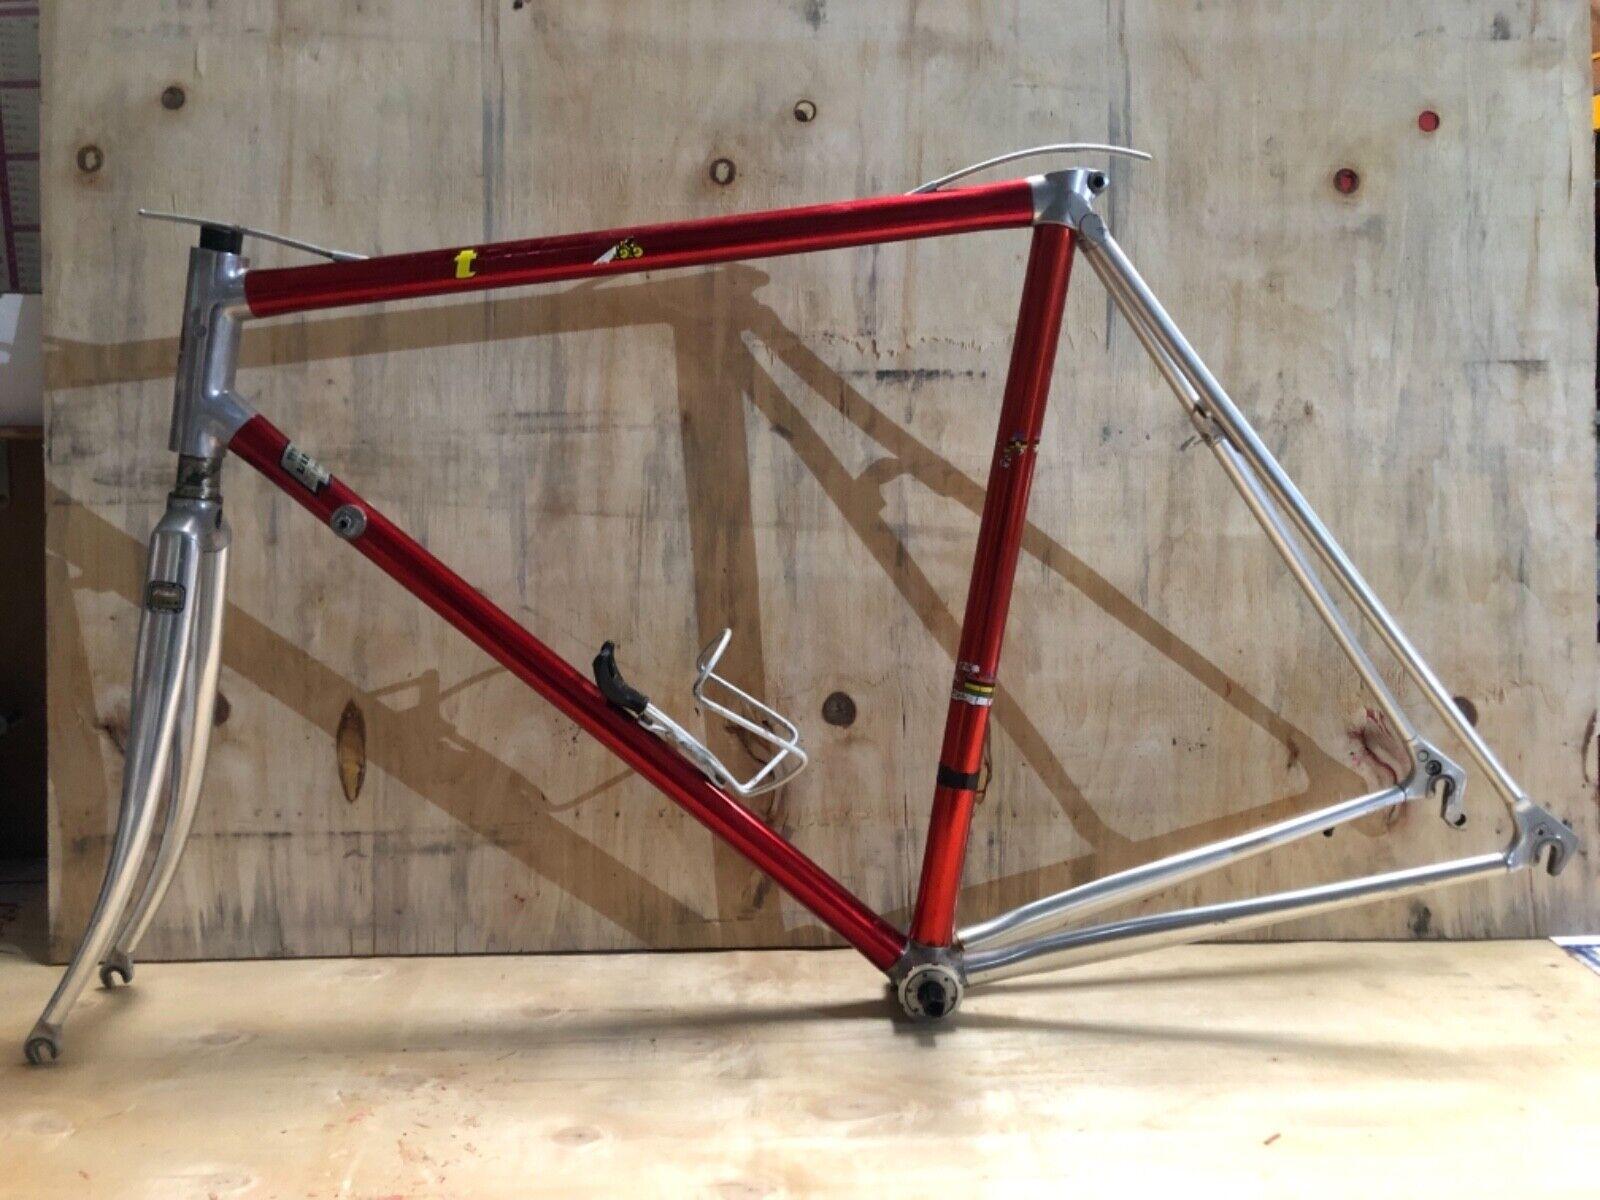 Kit cadre vitus 979 T53 TBE    frame kiT amazing condition